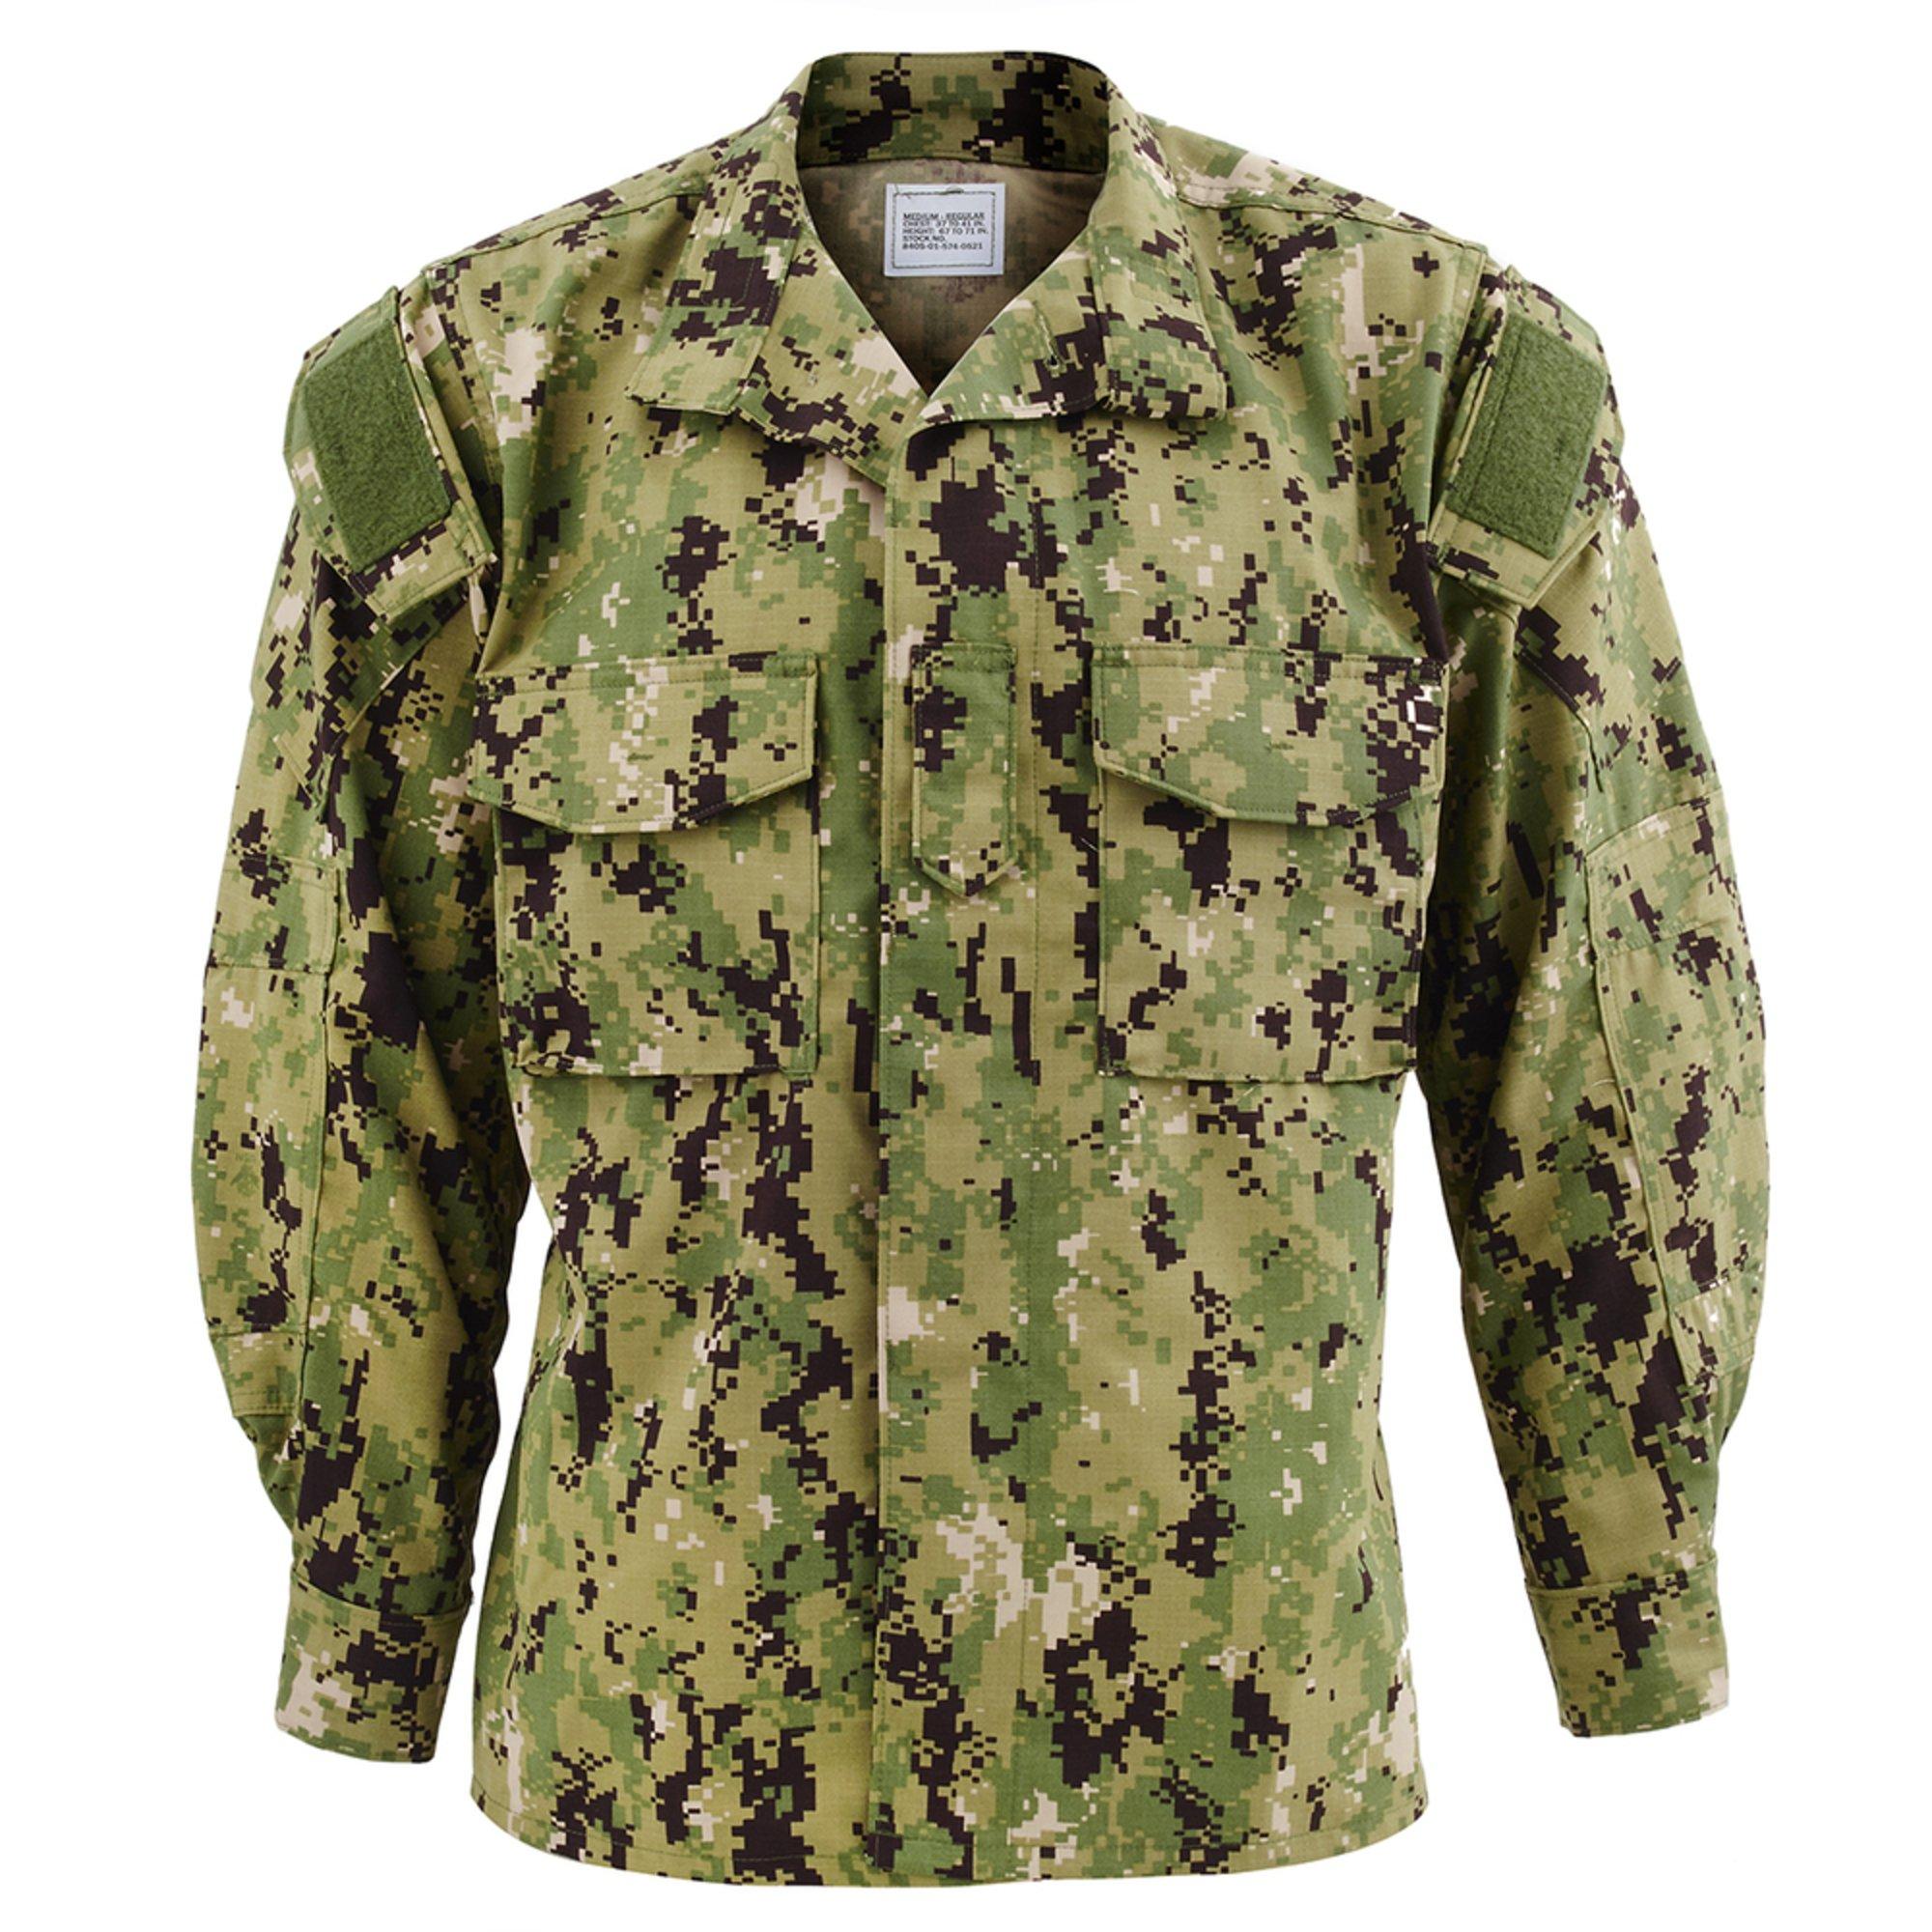 Navy Type 3 Undershirt 60 Off Newriversidehotel Com